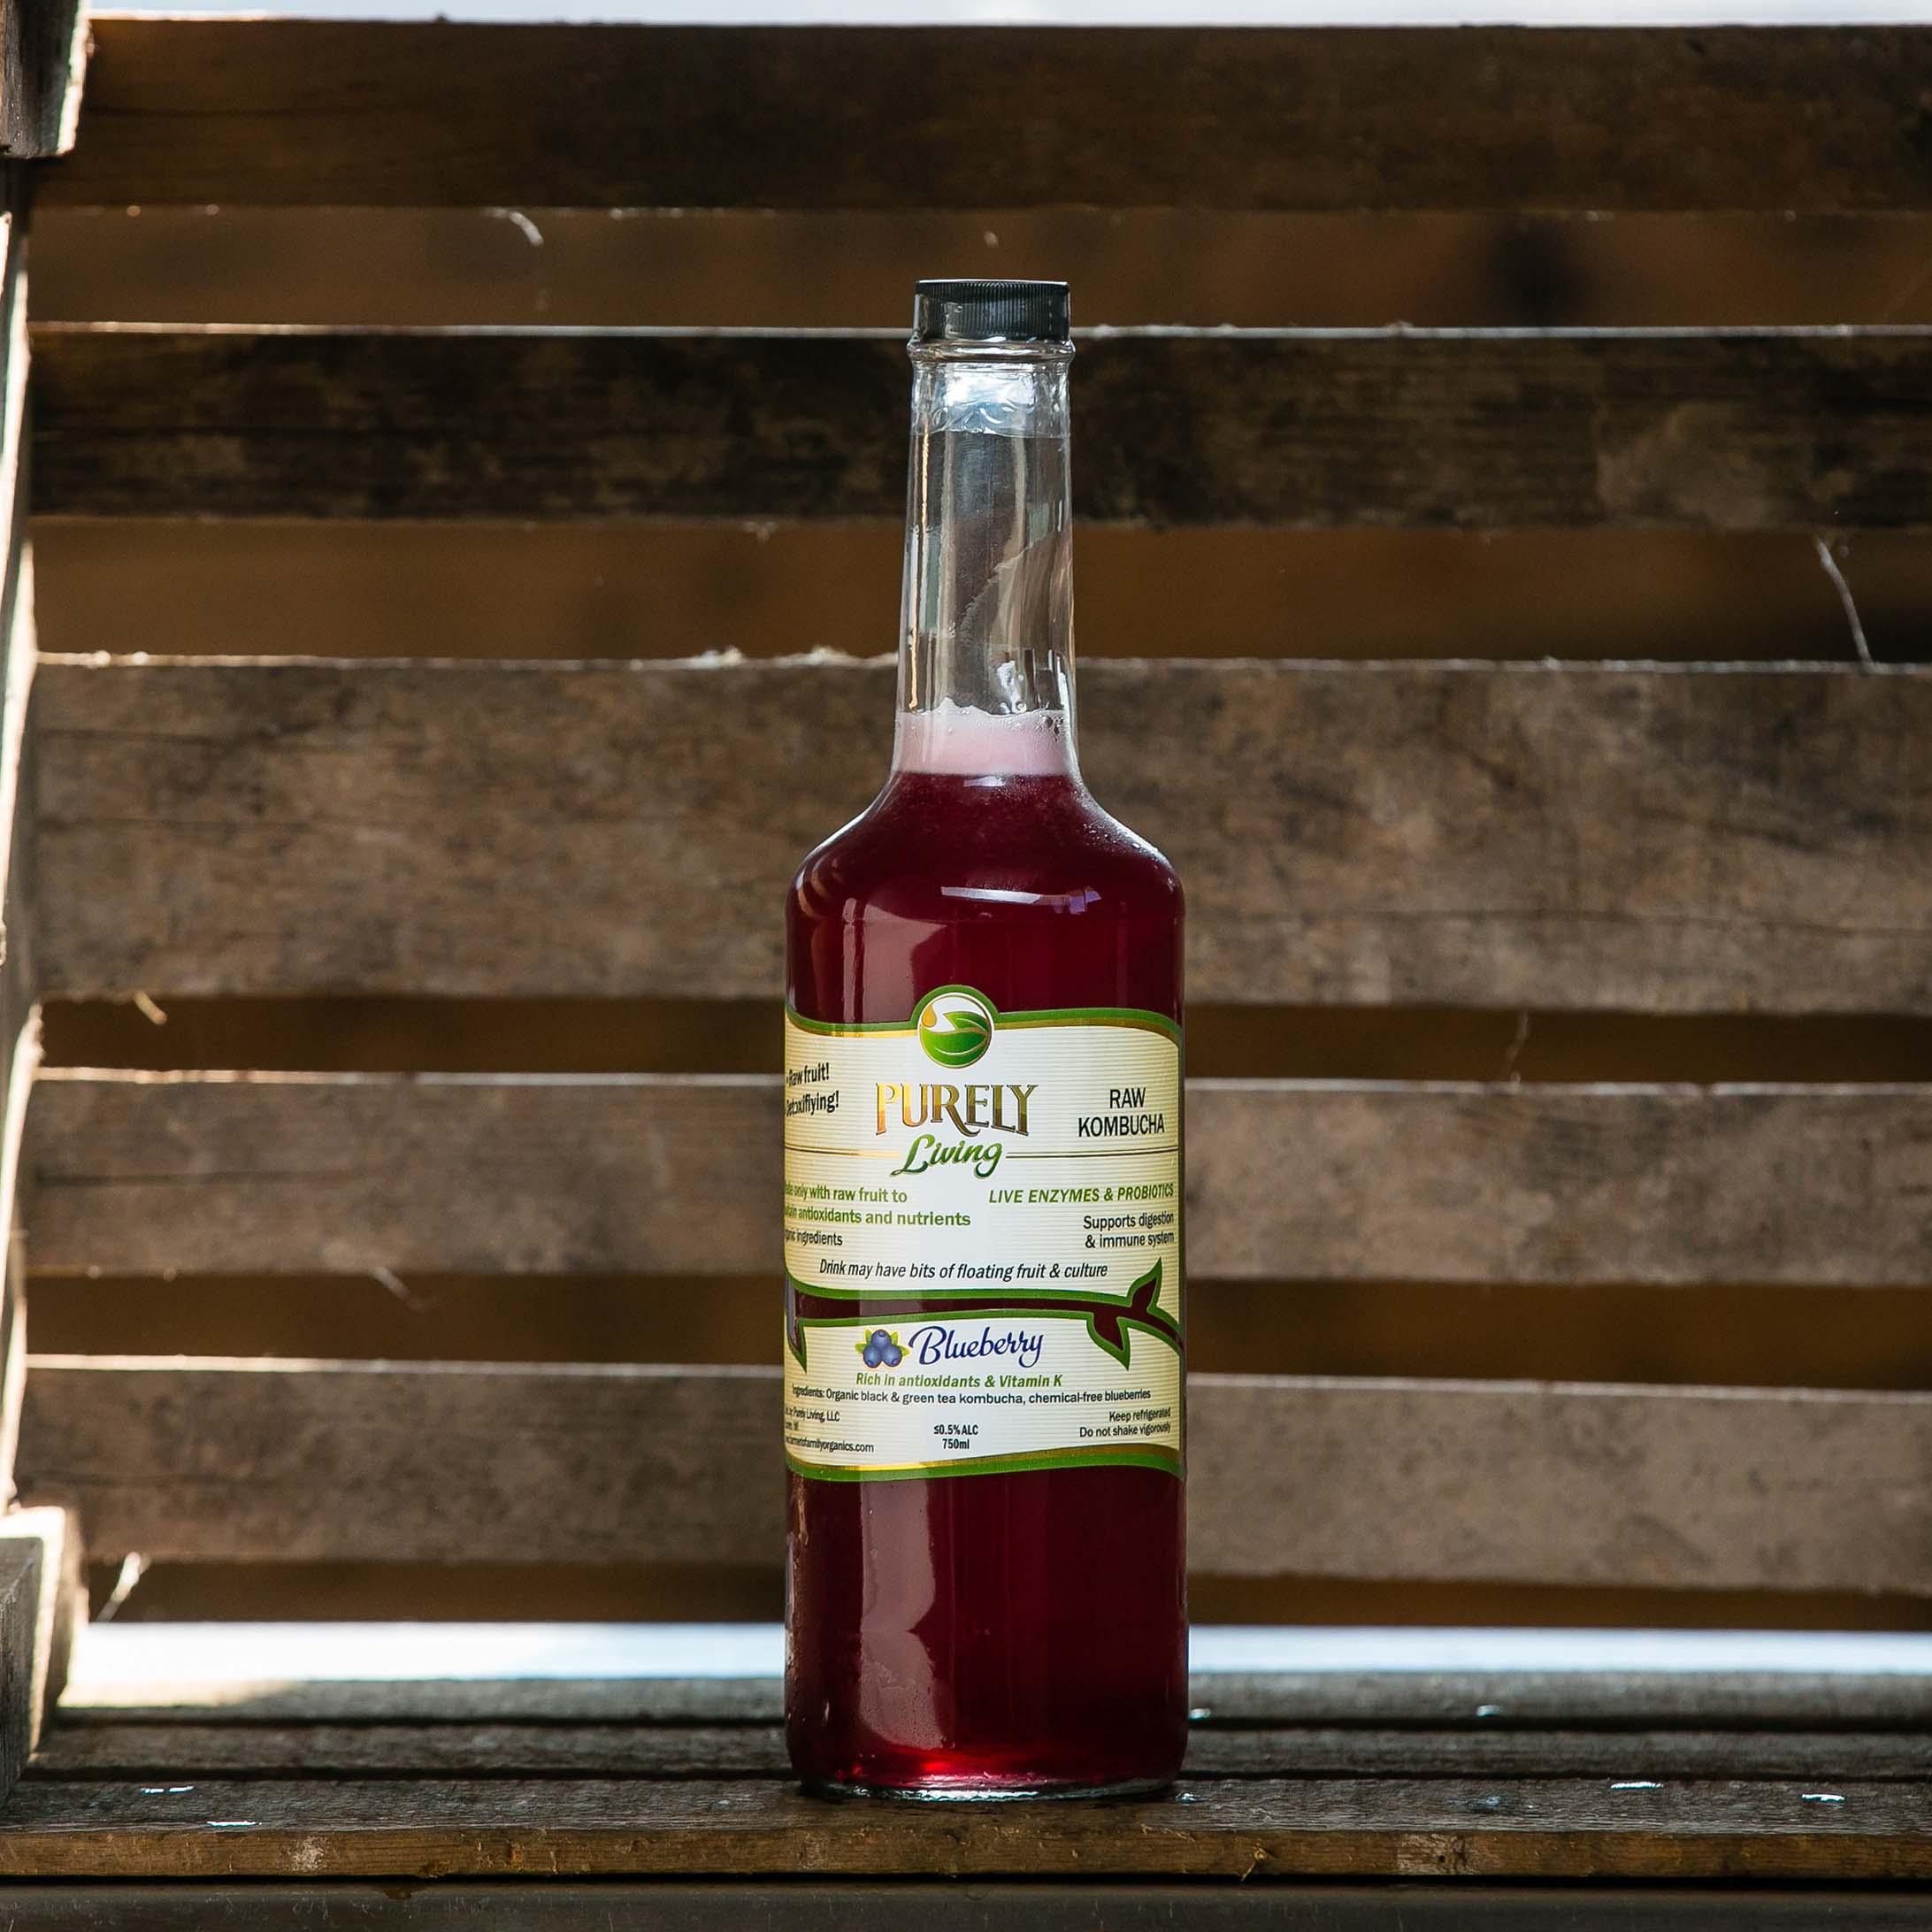 Blueberry - Ingredients: Organic Black and Green Tea Kombucha, Organic Raw Blueberries. More info.